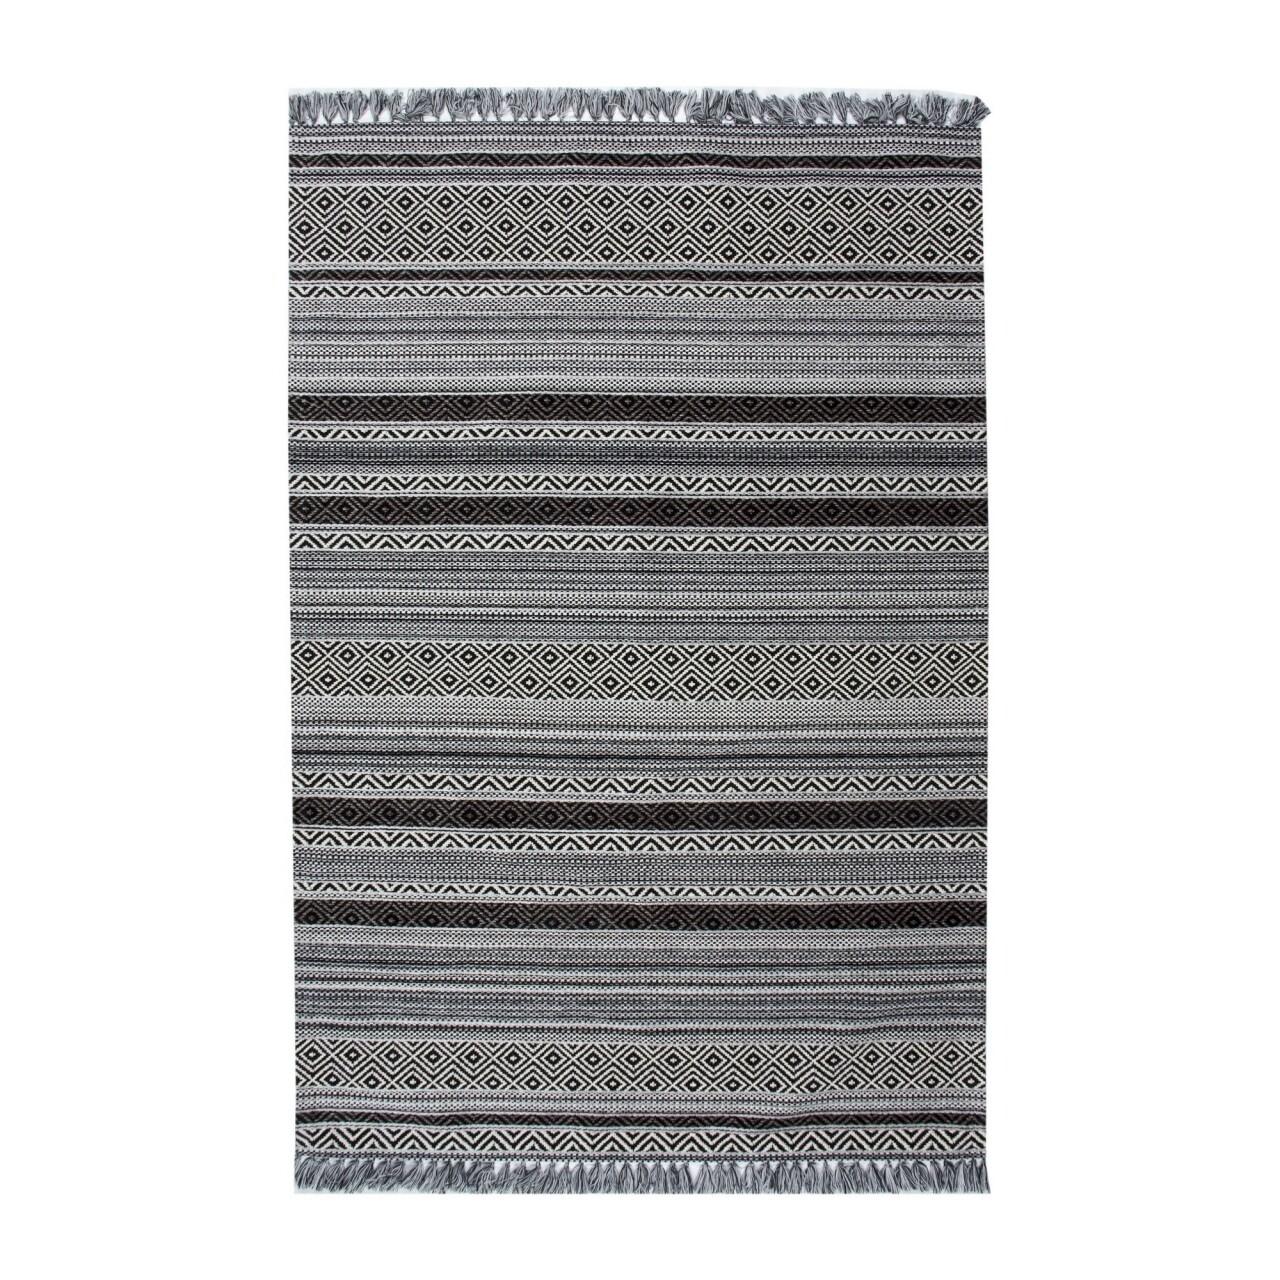 Covor rezistent IN 02 - White, Black, 80x150 cm, gri